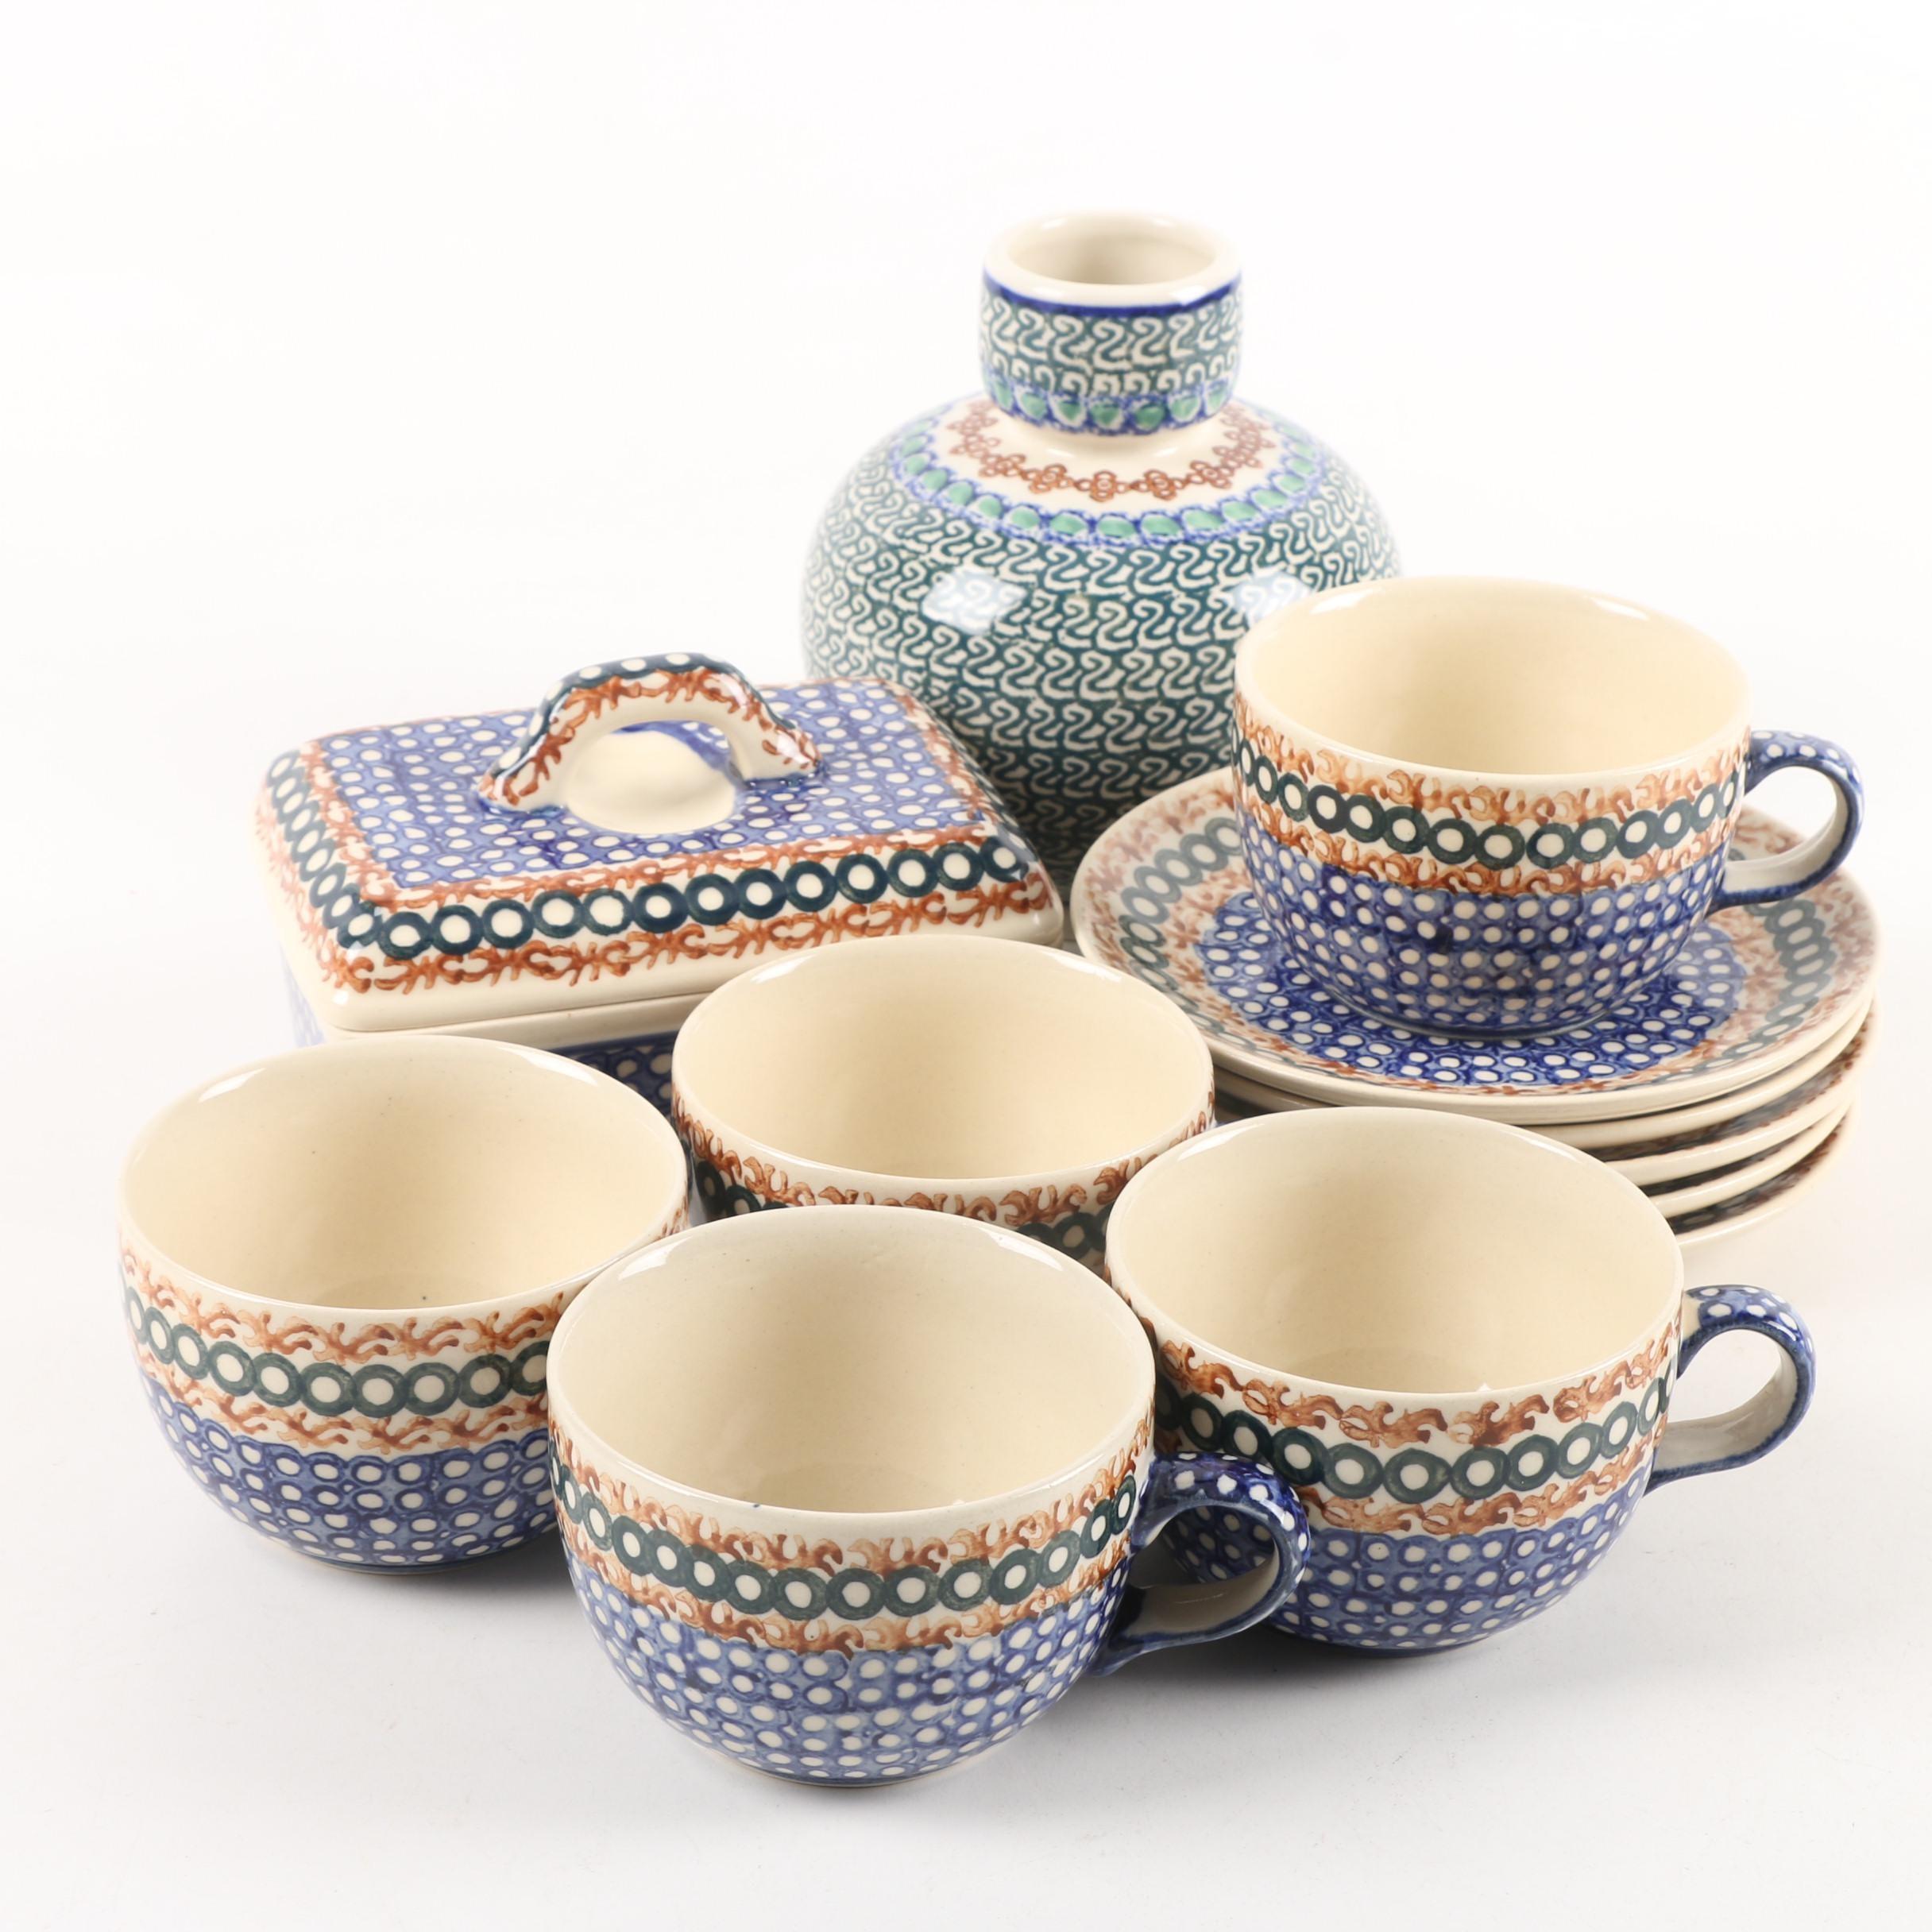 J. Okraska Pottery Vase and Boleslawiec Style Tableware